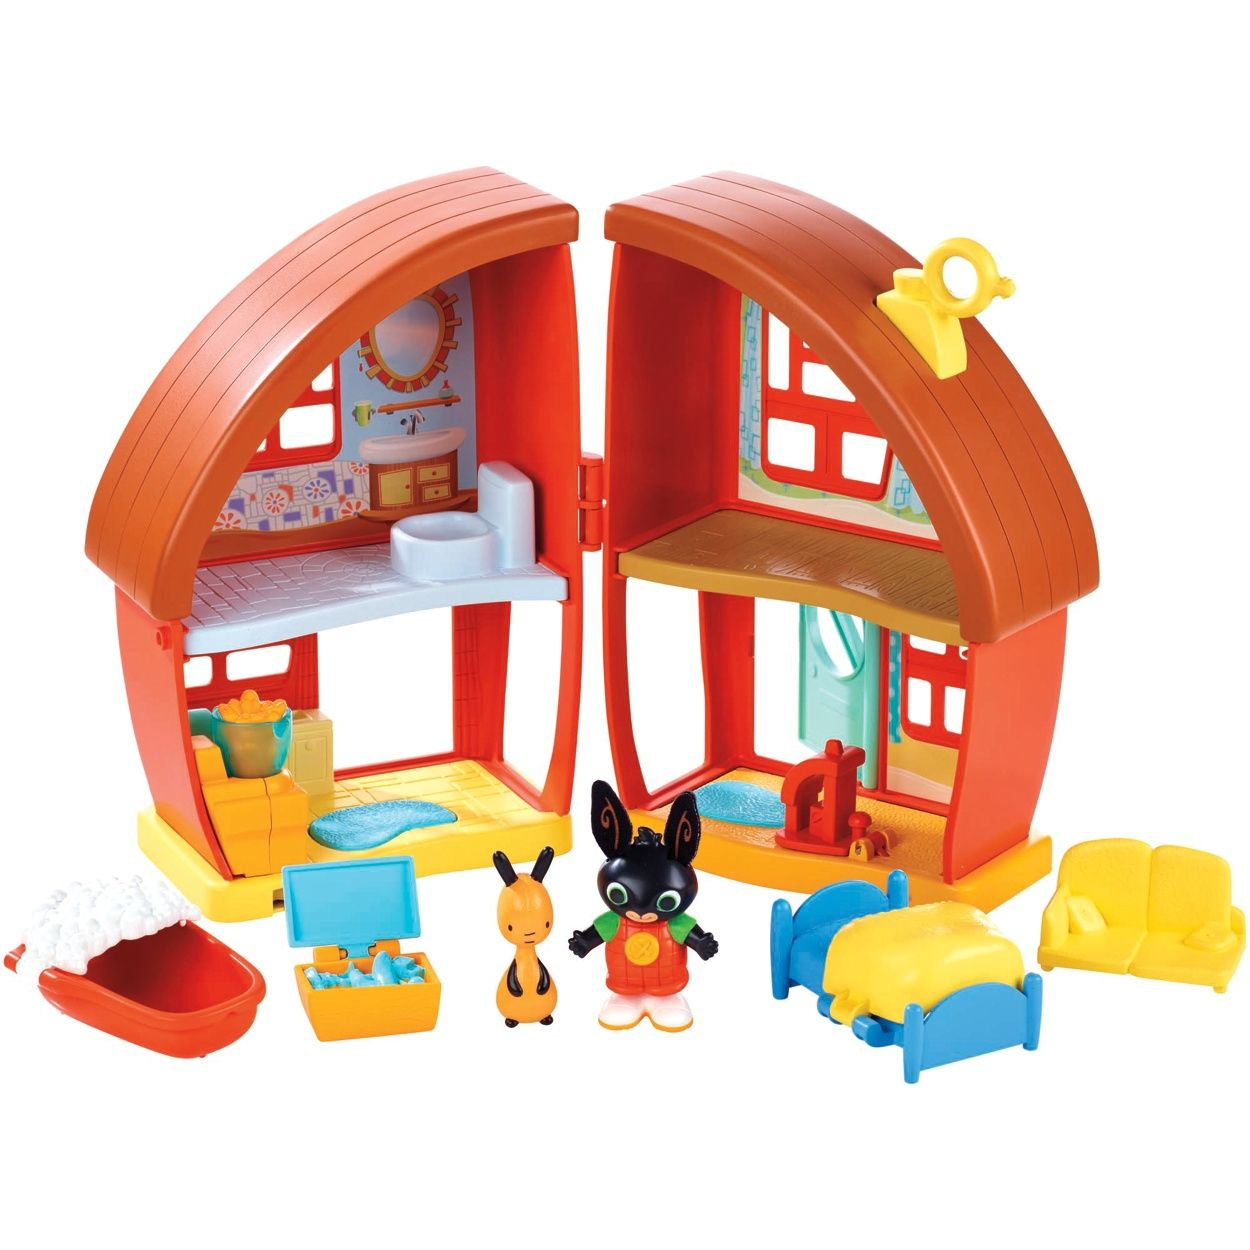 Mattel Bing Bunny Bing's House at